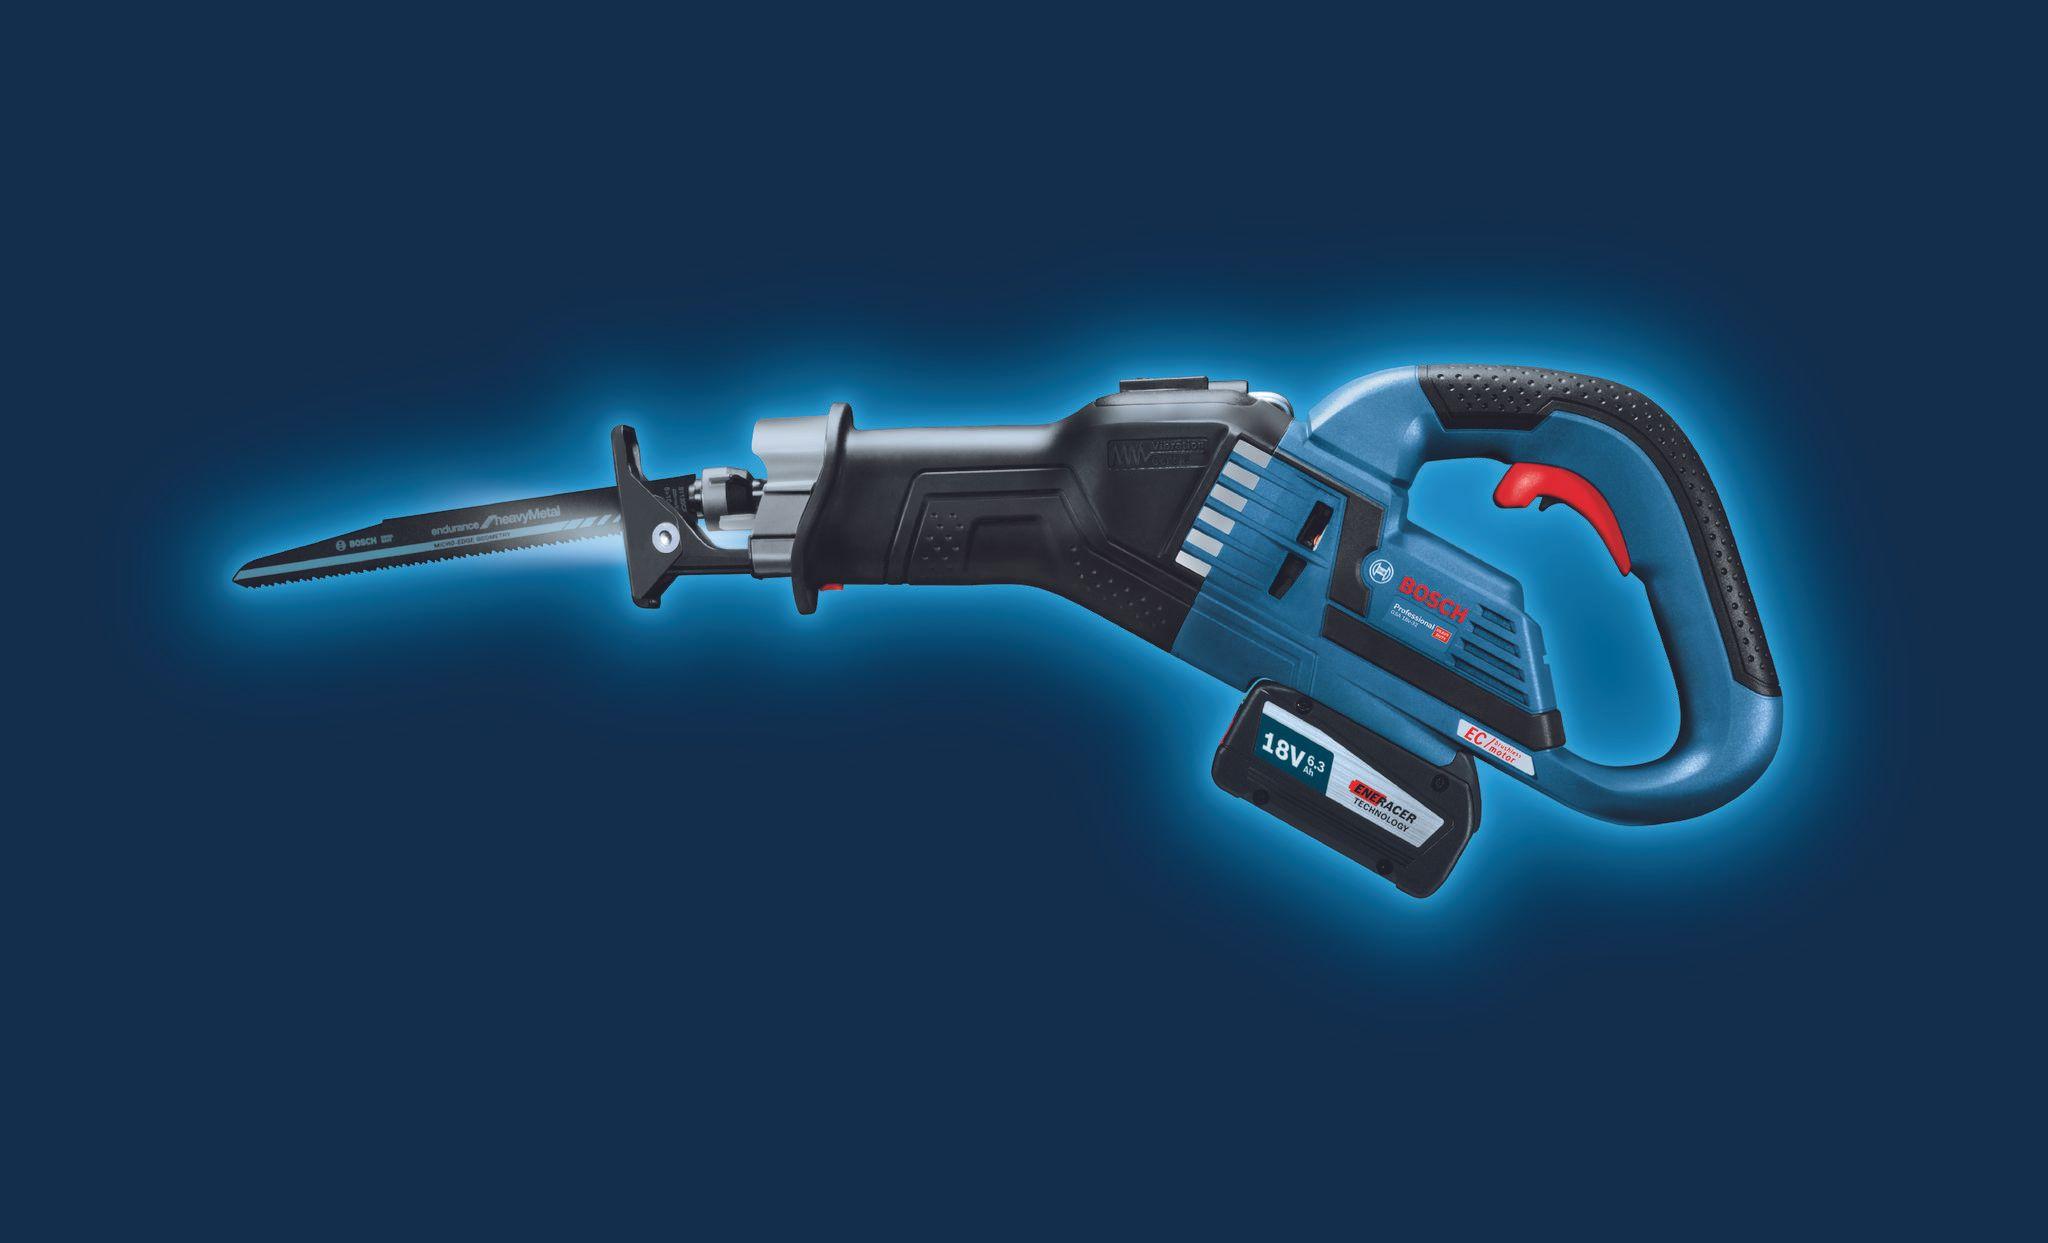 GSA 18V-32 Vibration Control: Work longer with minimum fatigue.